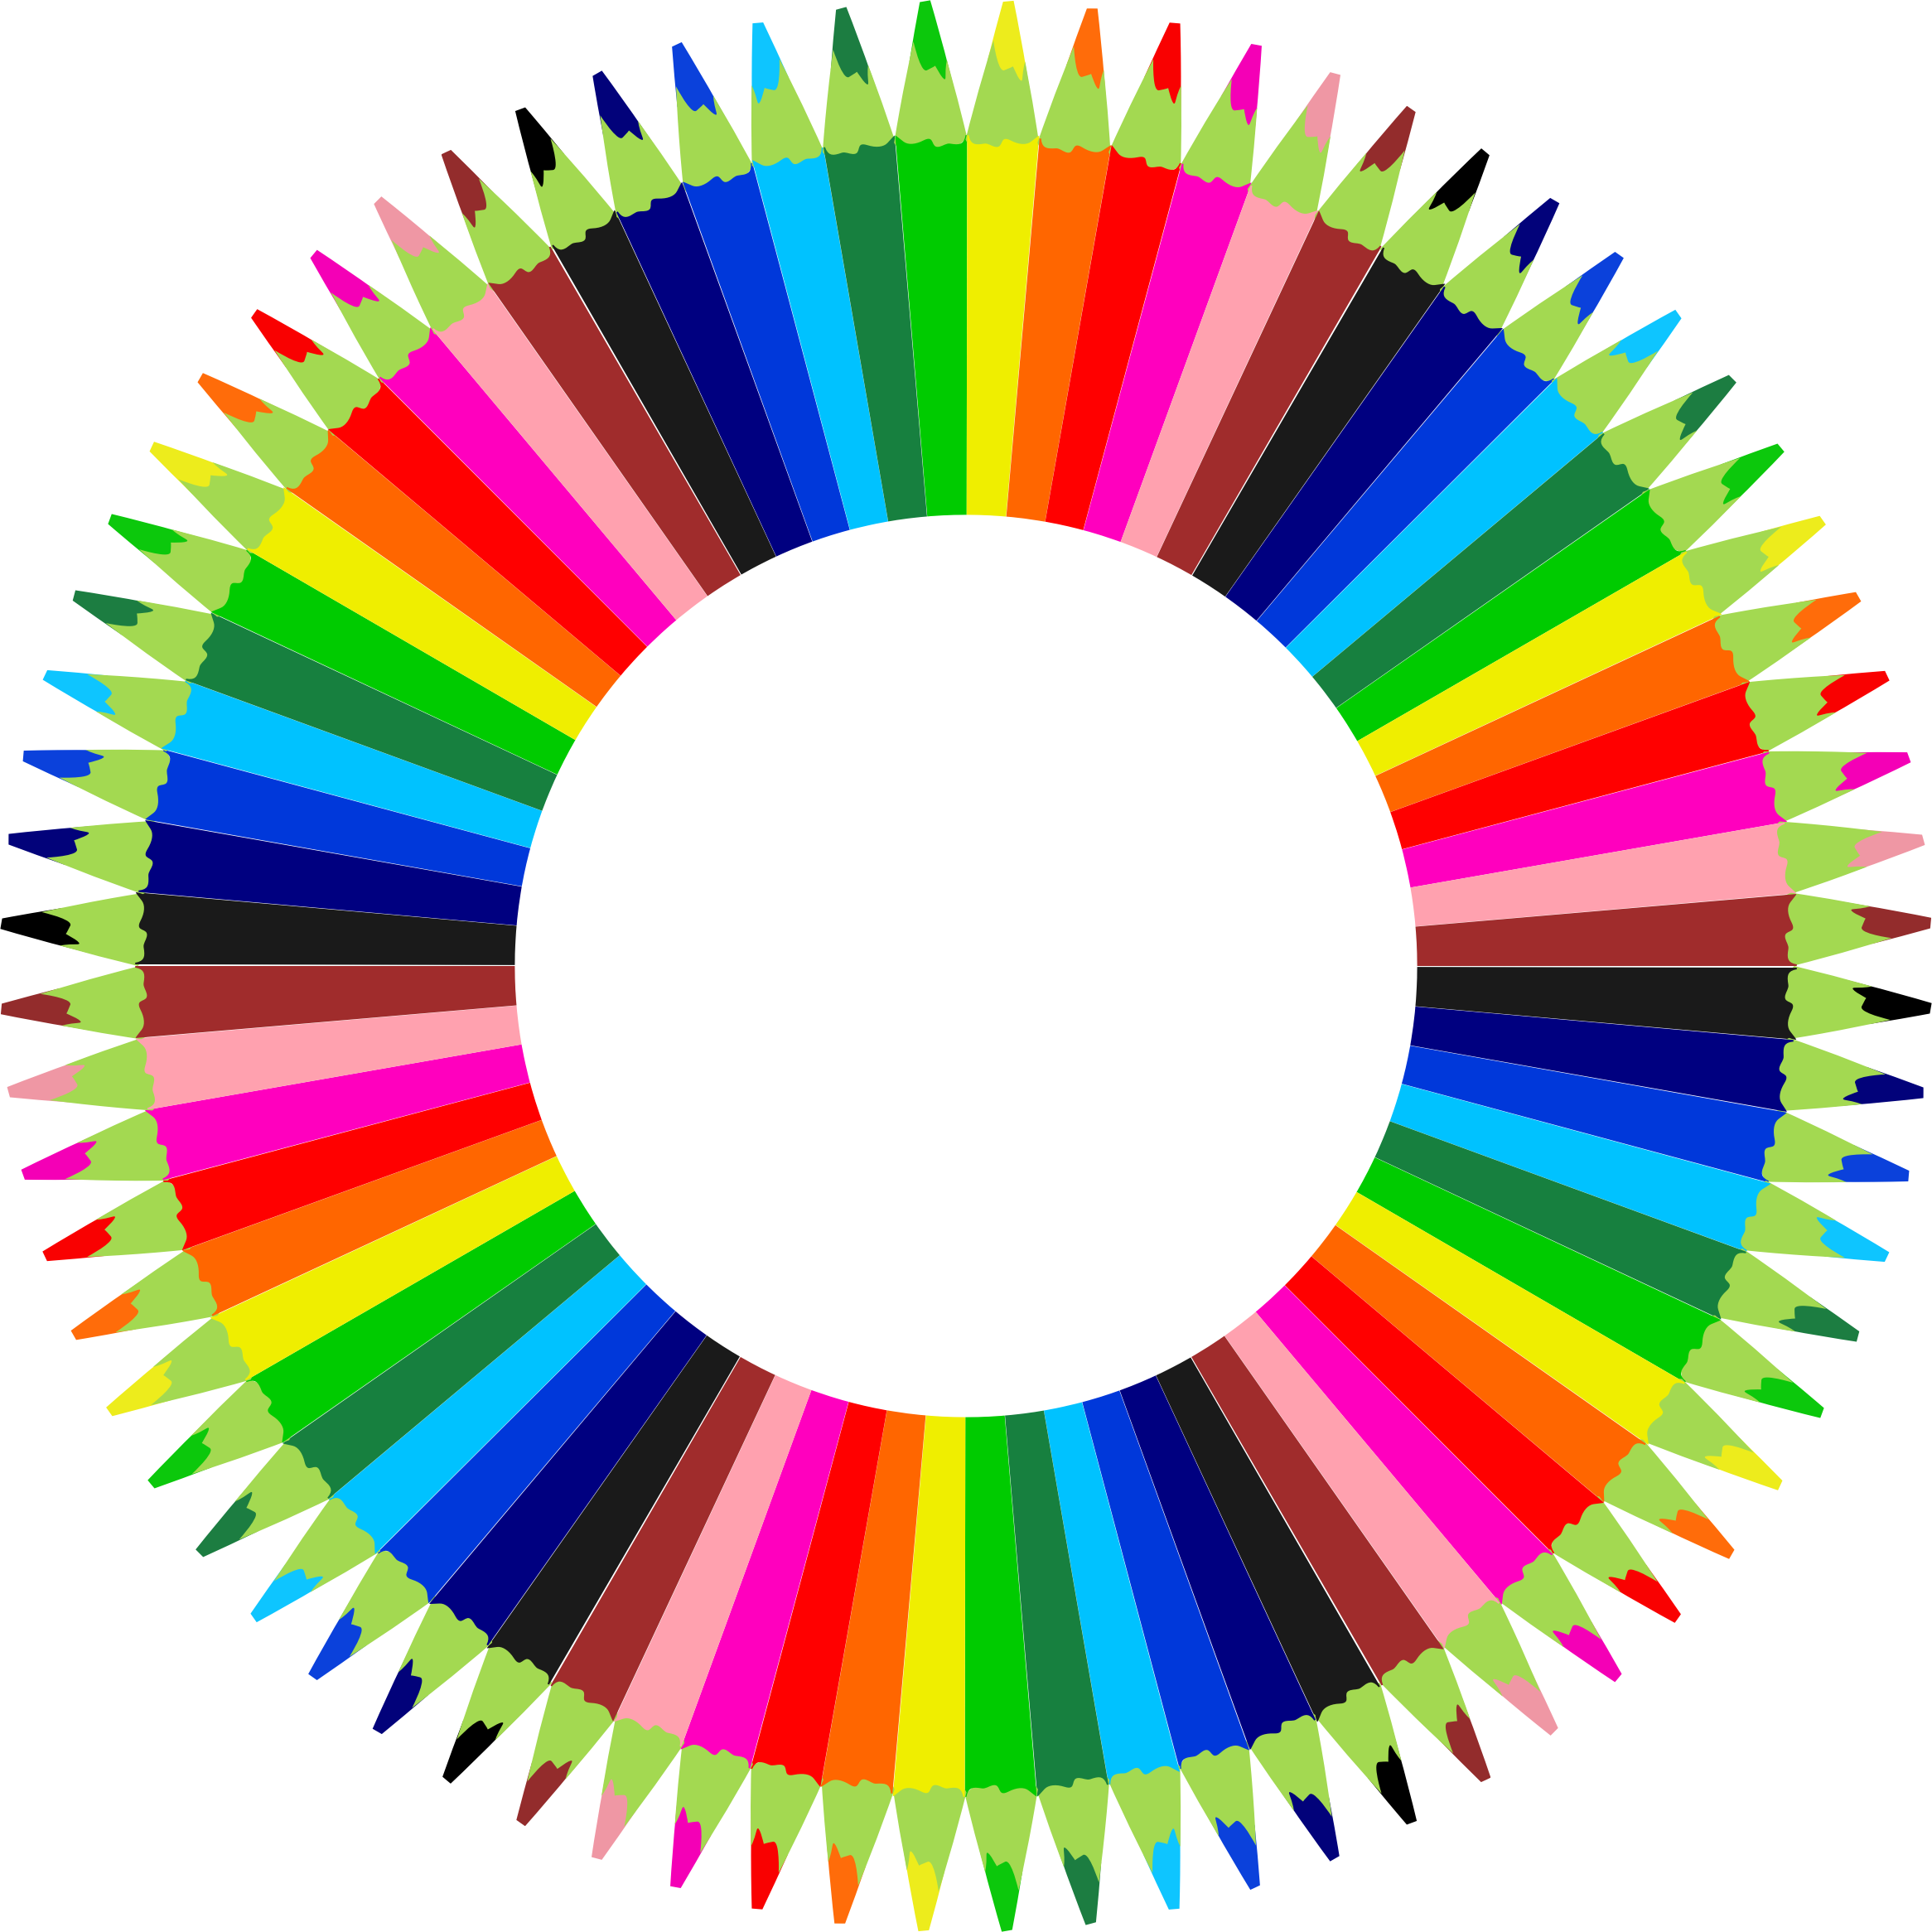 Circle clipart pencil. Colorful pencils frame big